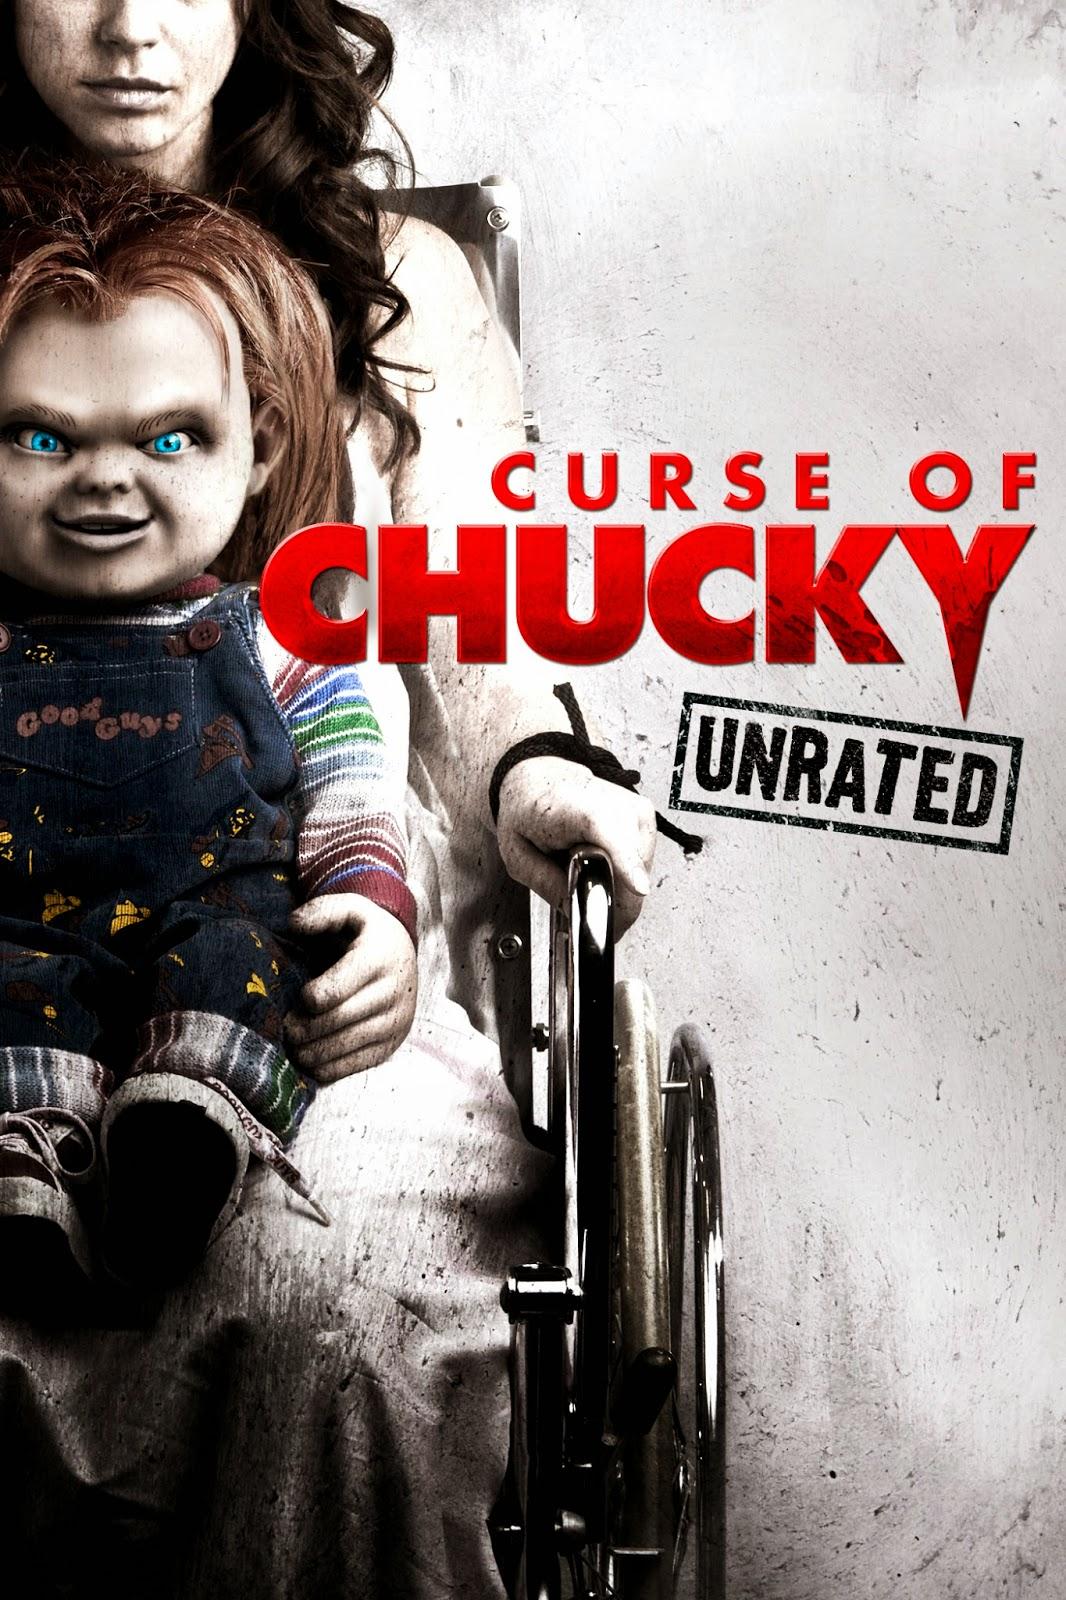 Child's Play 6 Curse of Chucky คำสาปแค้นฝังหุ่น [HD][พากย์ไทย]